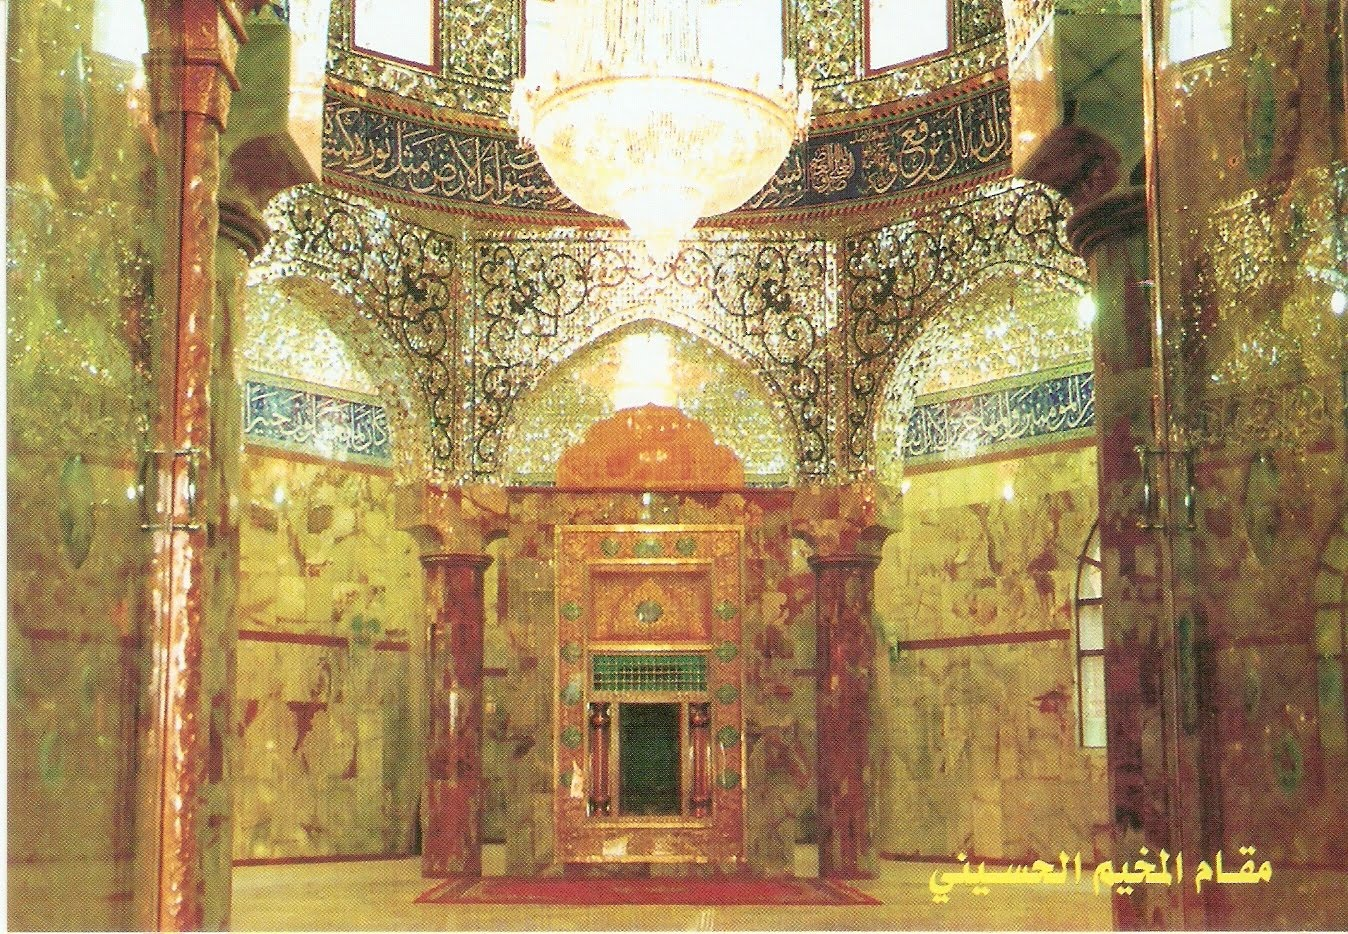 Maula Ali Shrine Wallpaper: Live Shrine Of Roza Imam Hussain As Mehfil E Hussaini